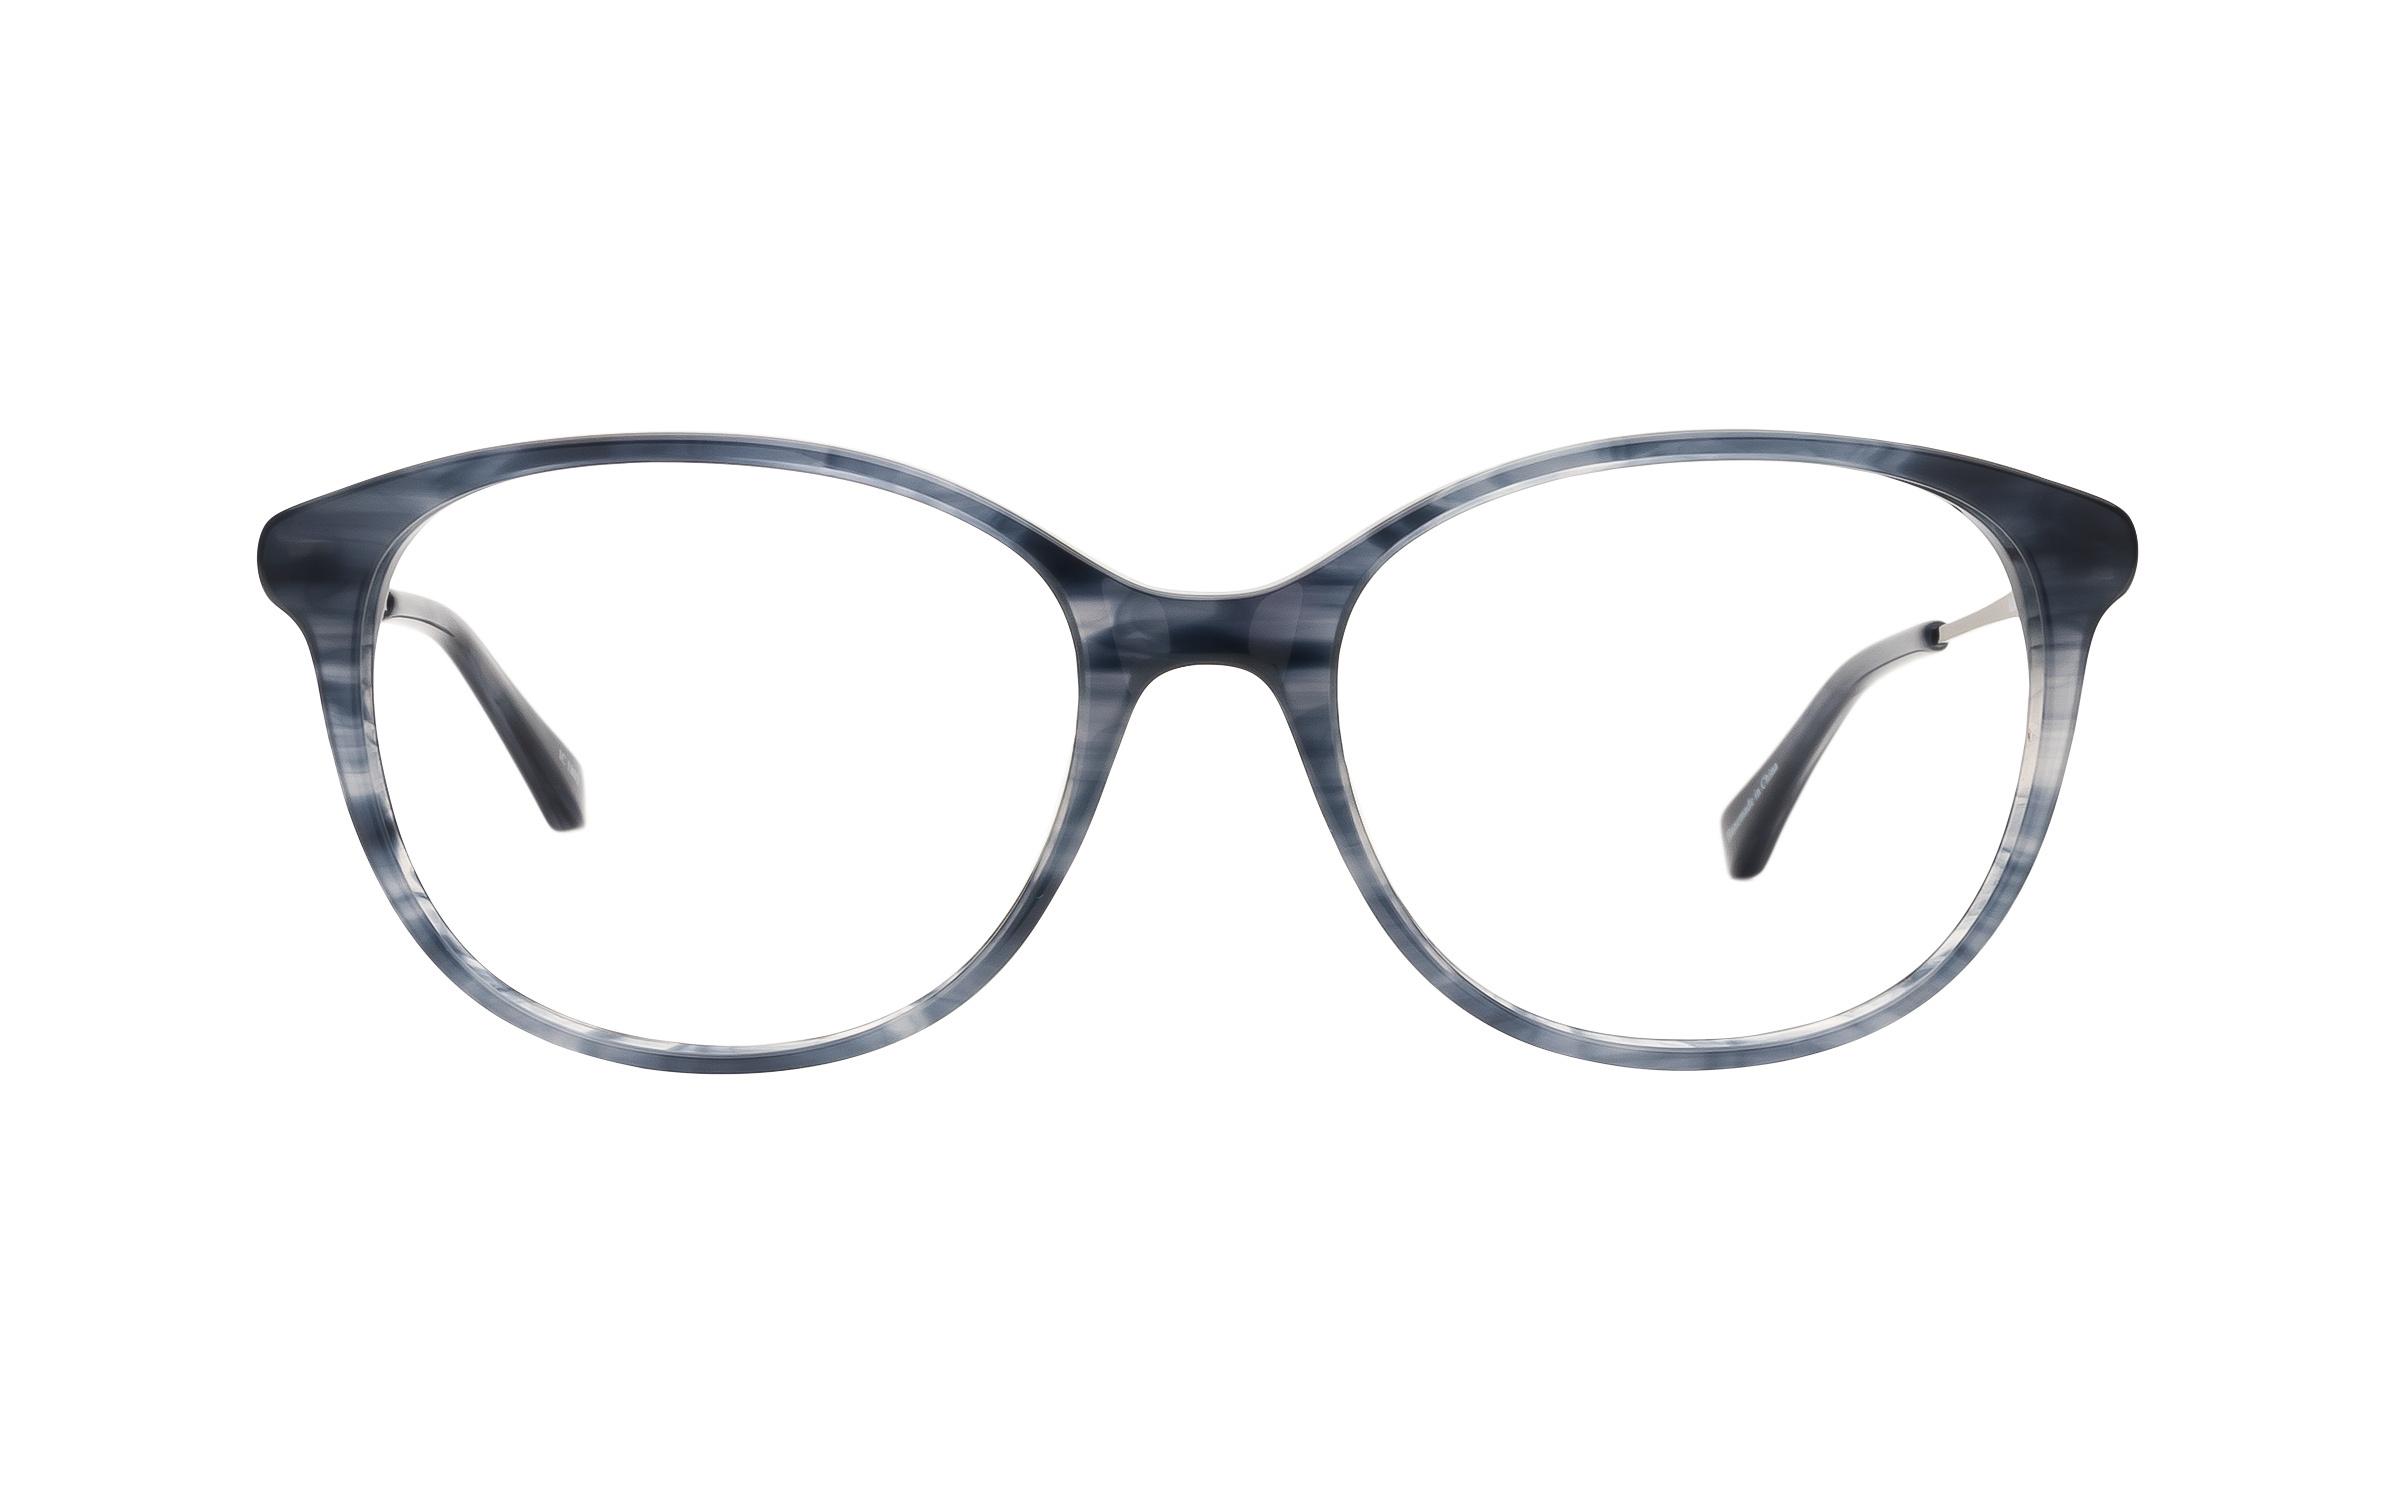 Kam Dhillon Women's Glasses D-Frame Blue/Clear Acetate/Metal Online Coastal